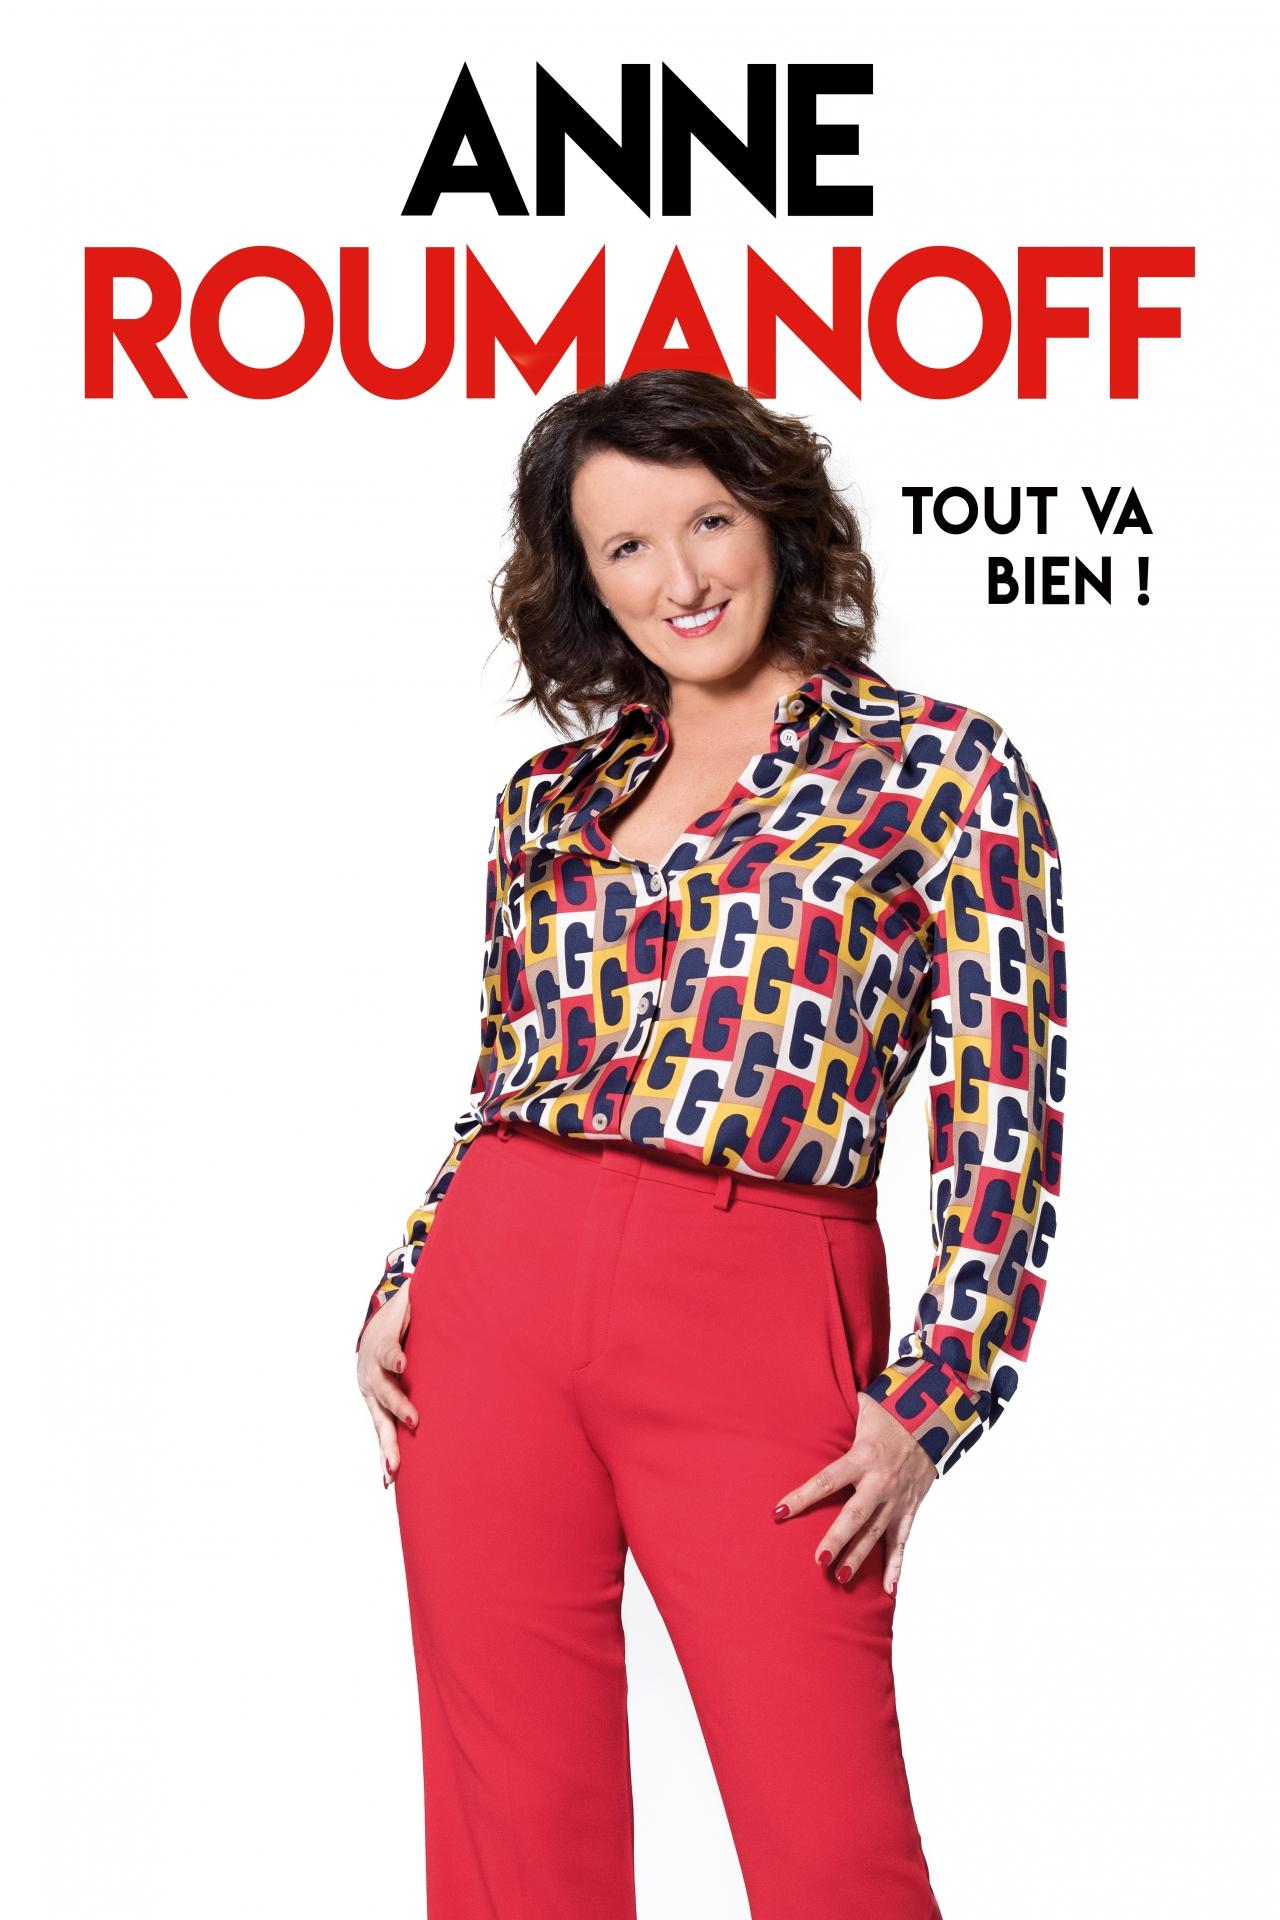 Anne Roumanoff : « Tout va bien ! »